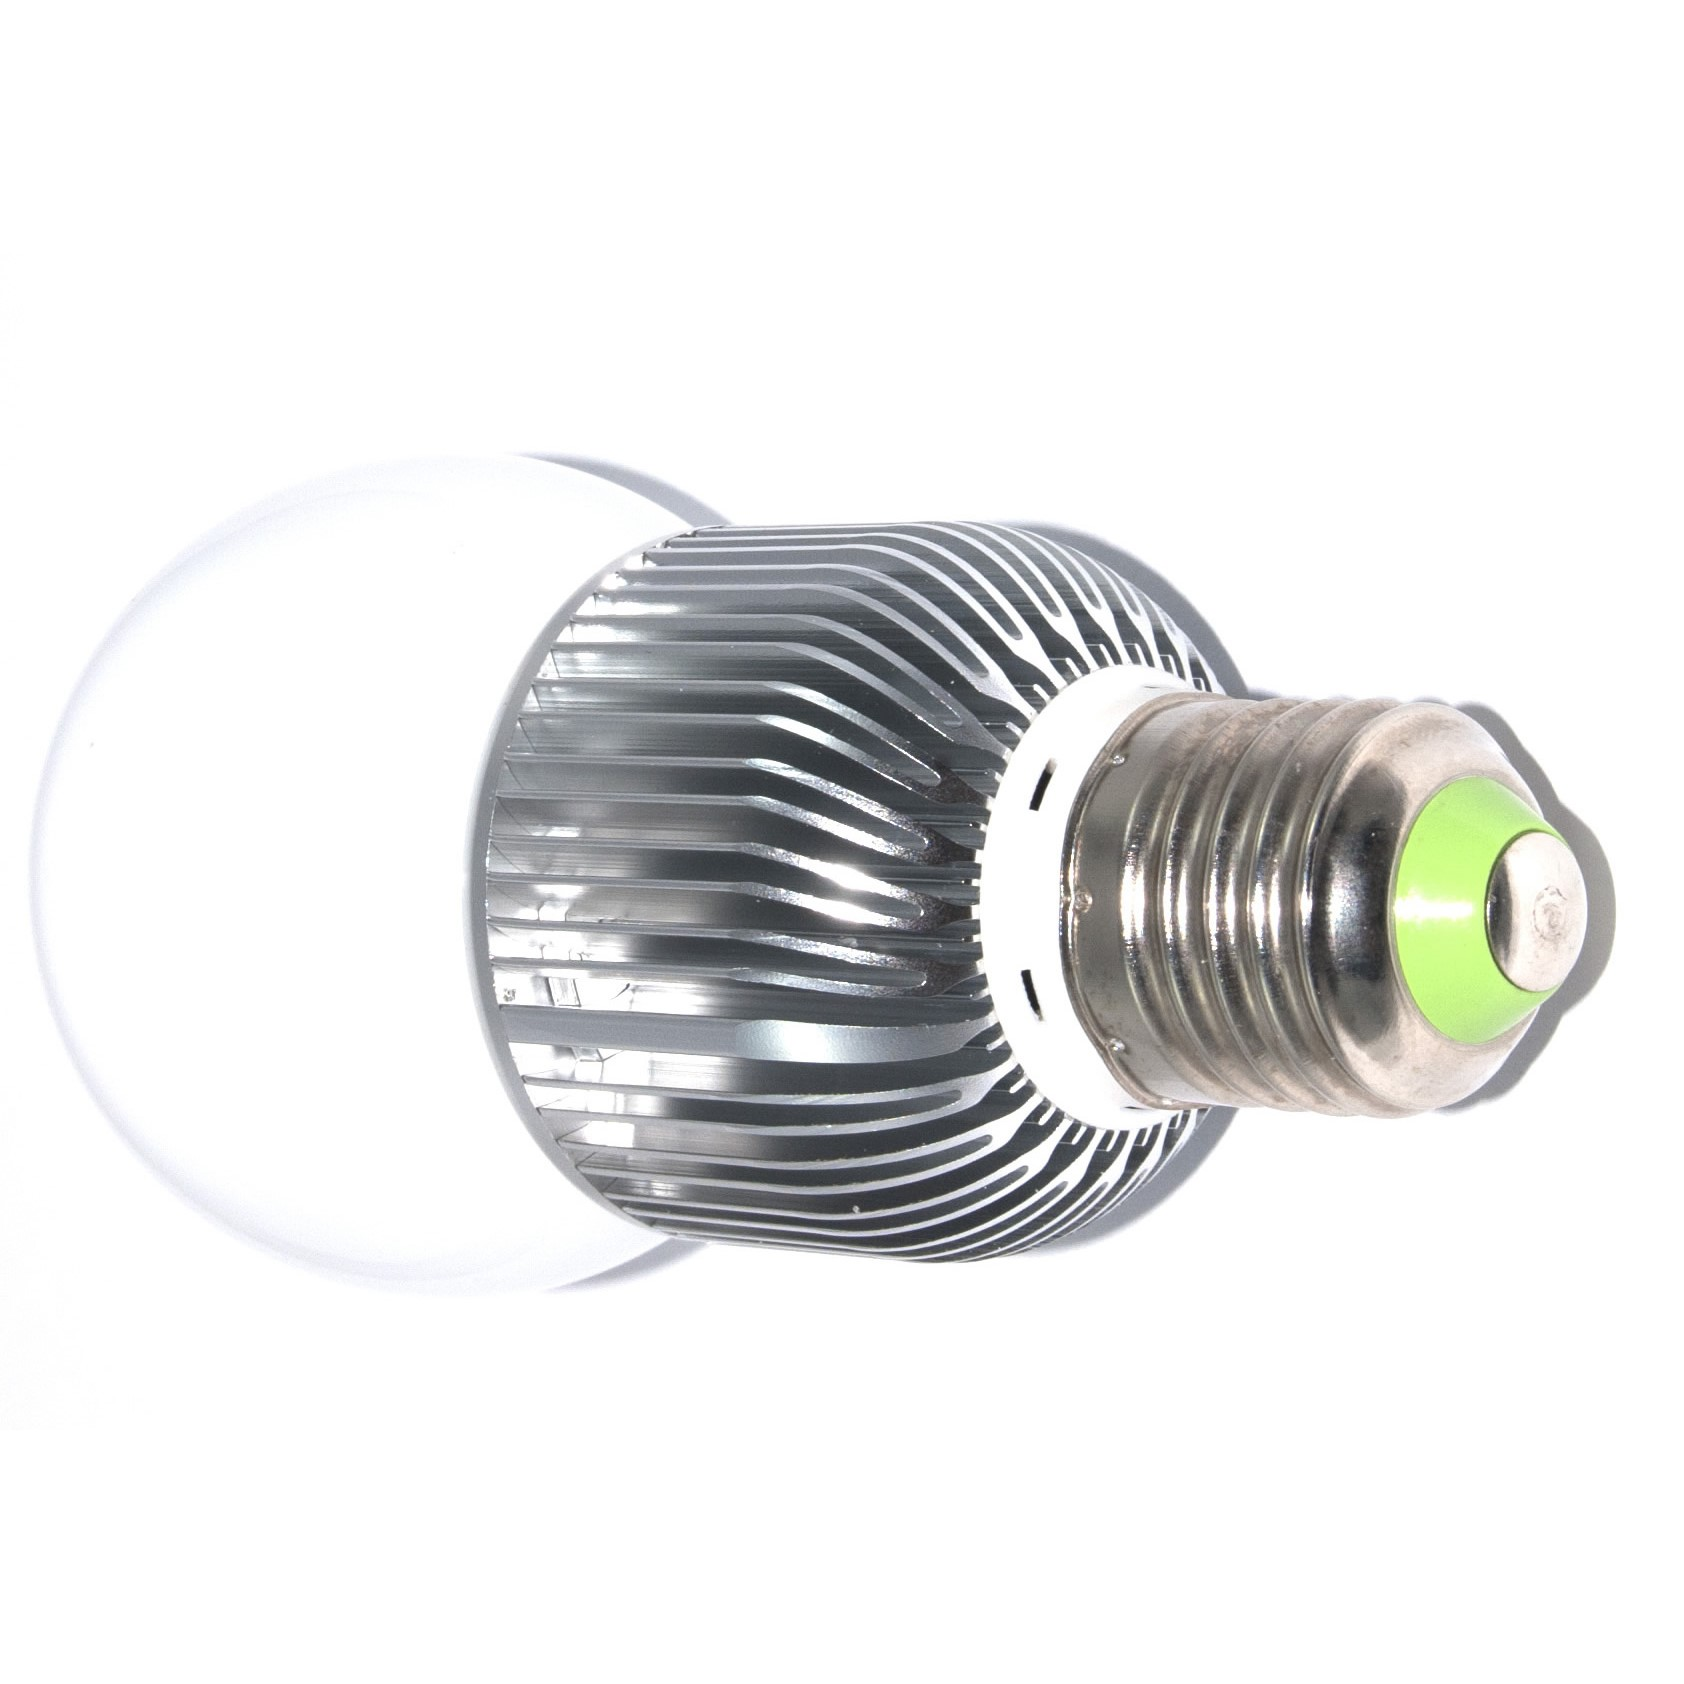 Led-gloeilamp-6-watt-smd-samsung-370-lumen Spannende Led Lampen 12 Volt Dekorationen